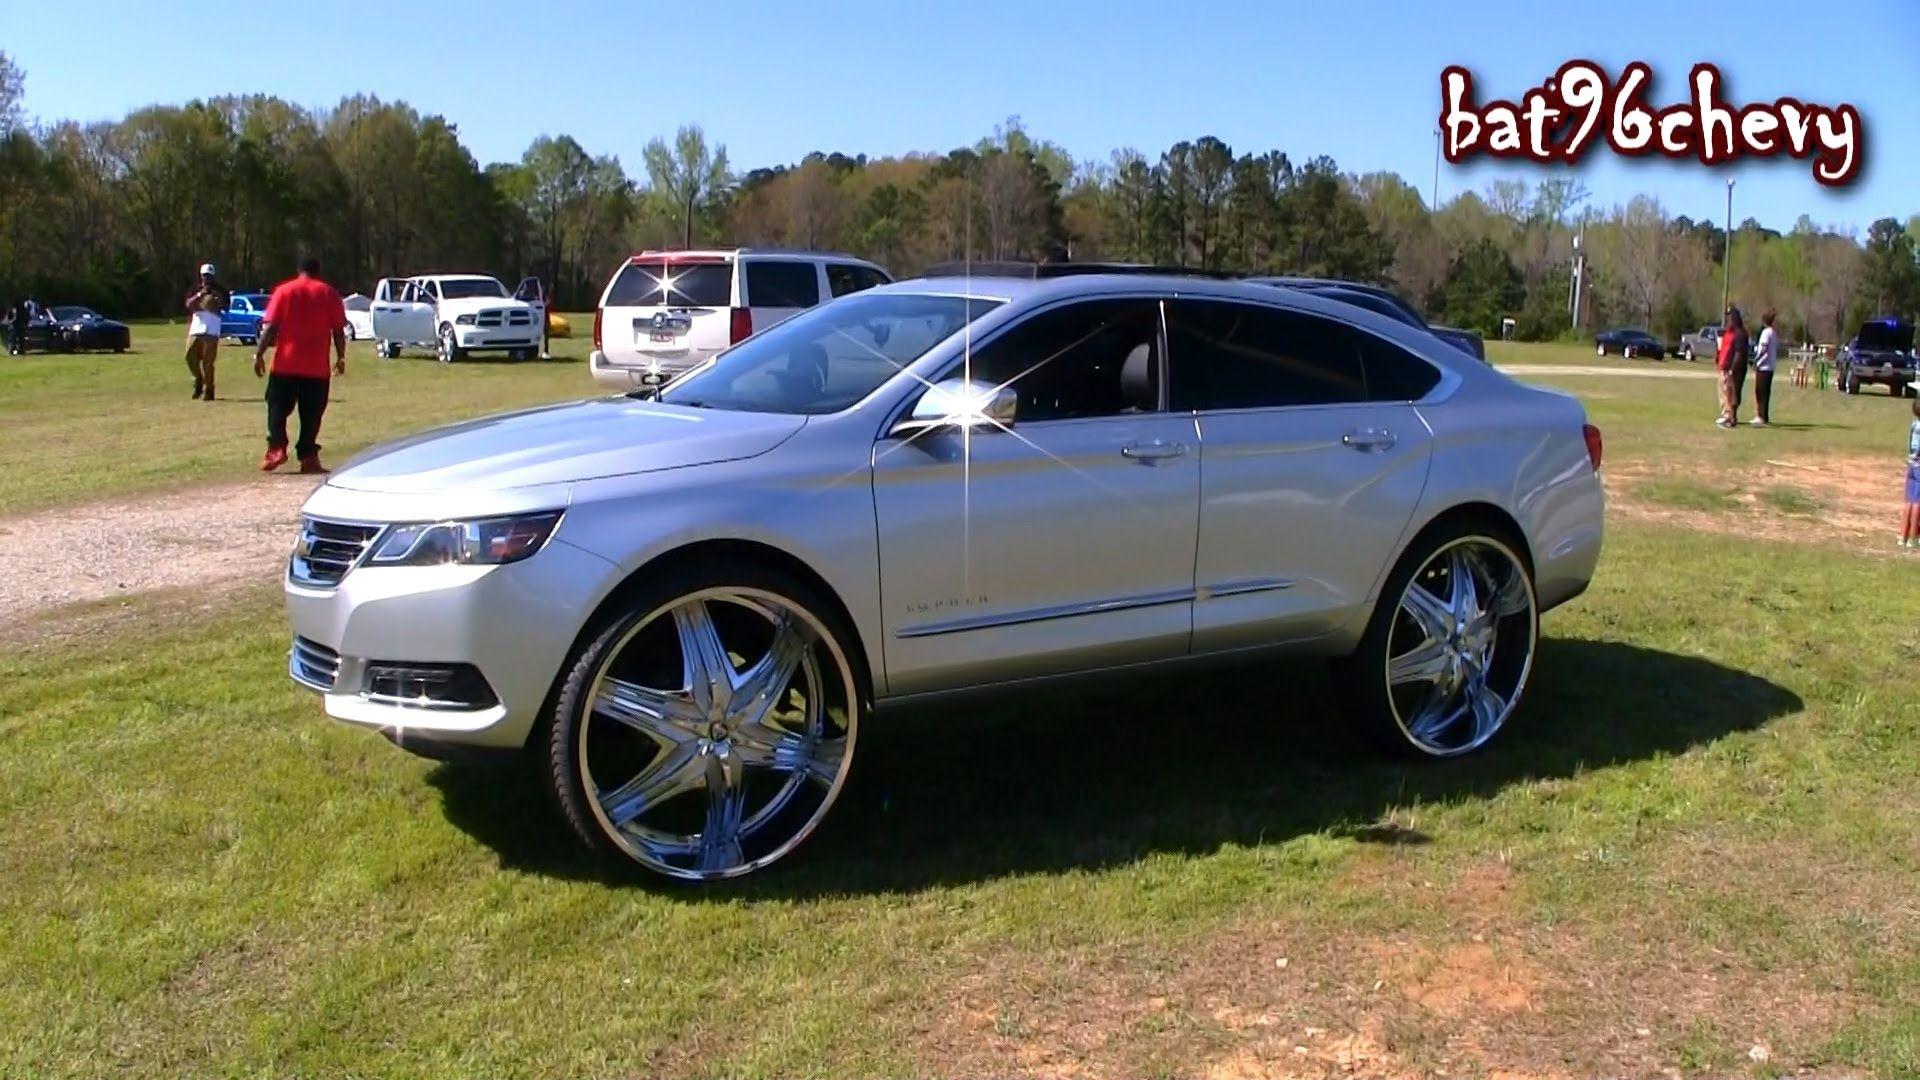 30 inch rims on impala 2015 chevrolet impala ltz on 30 diablo elite wheels